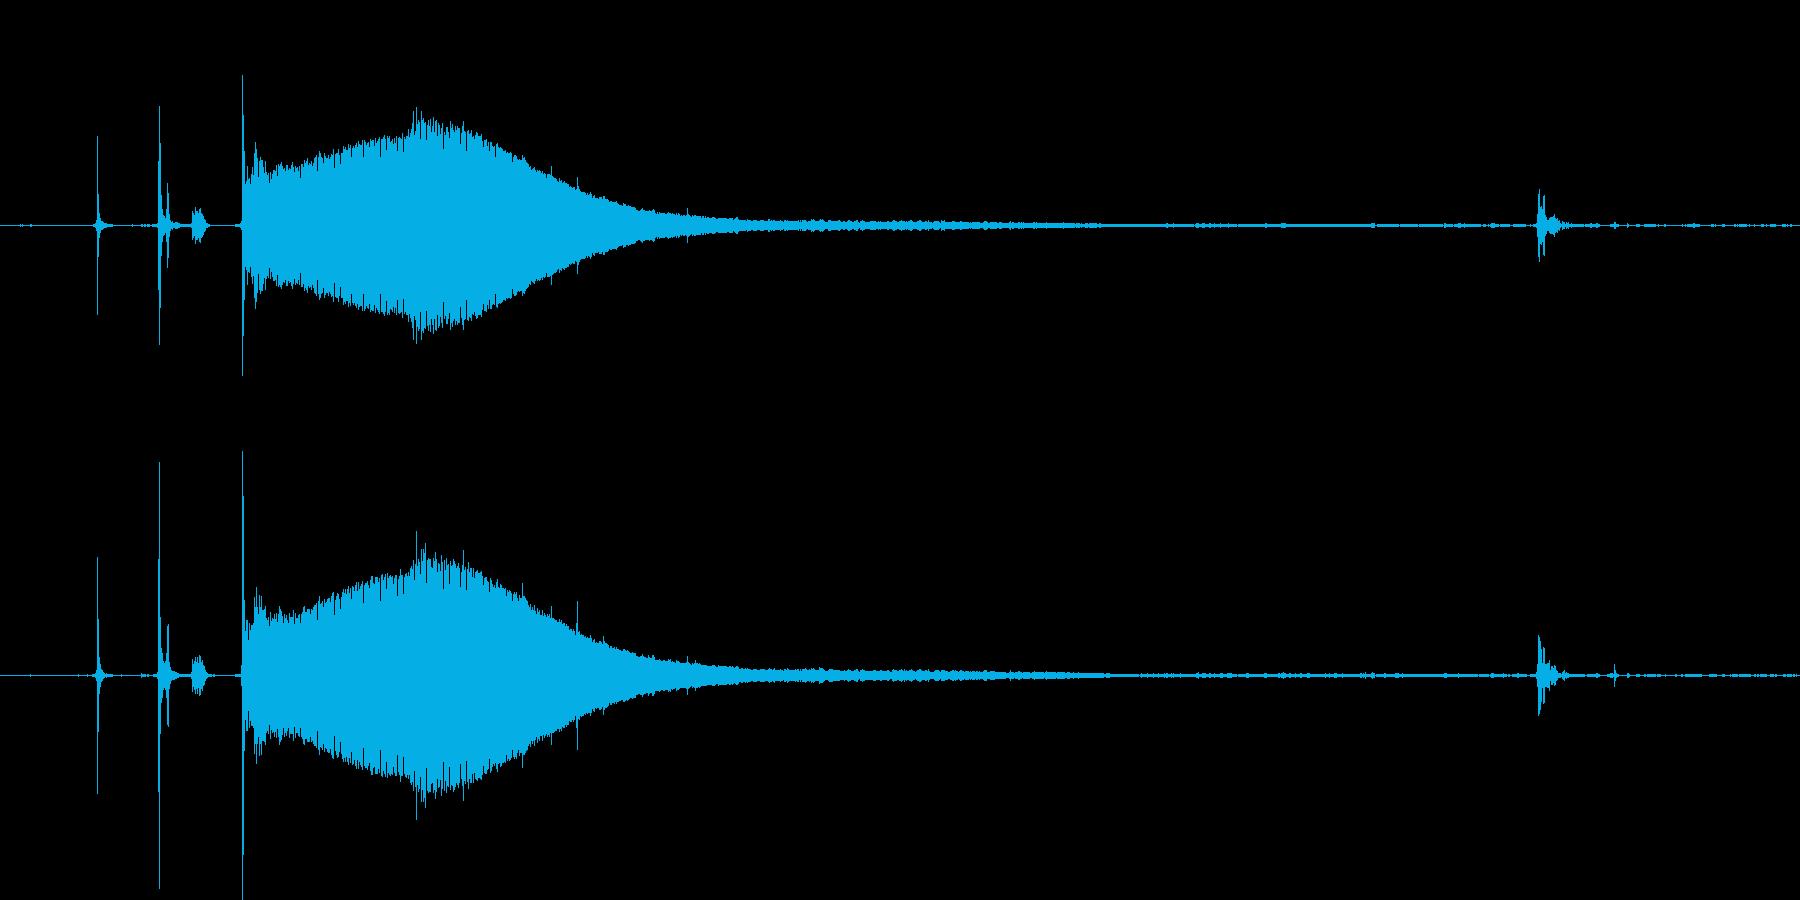 CRTモニターの起動音。の再生済みの波形